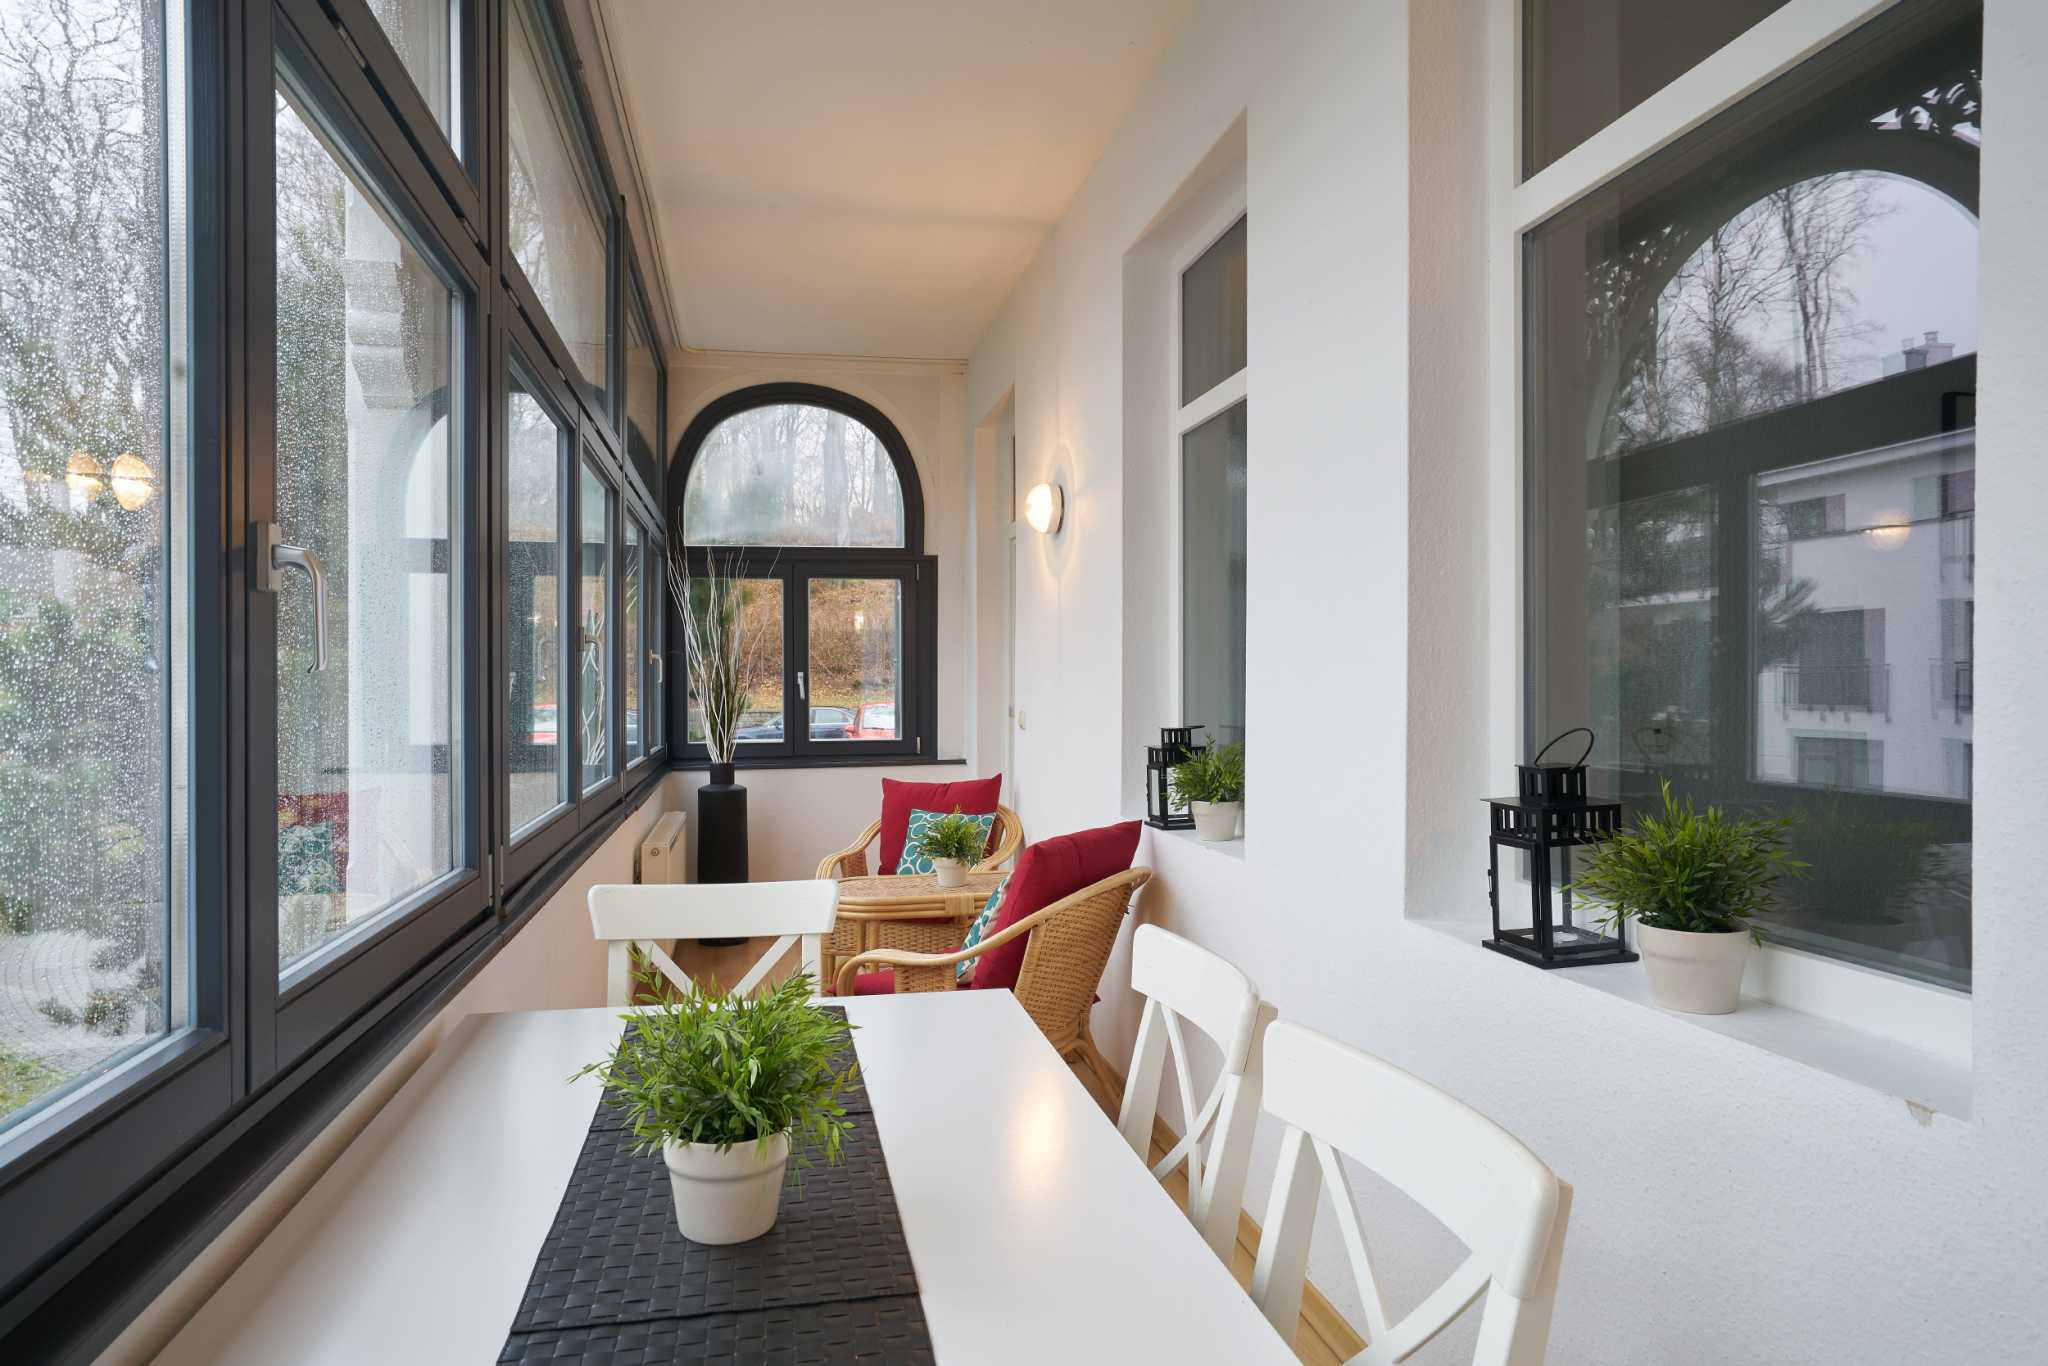 Haus am Meer, App. 6, großer, möbl. Wintergarten, strandnah